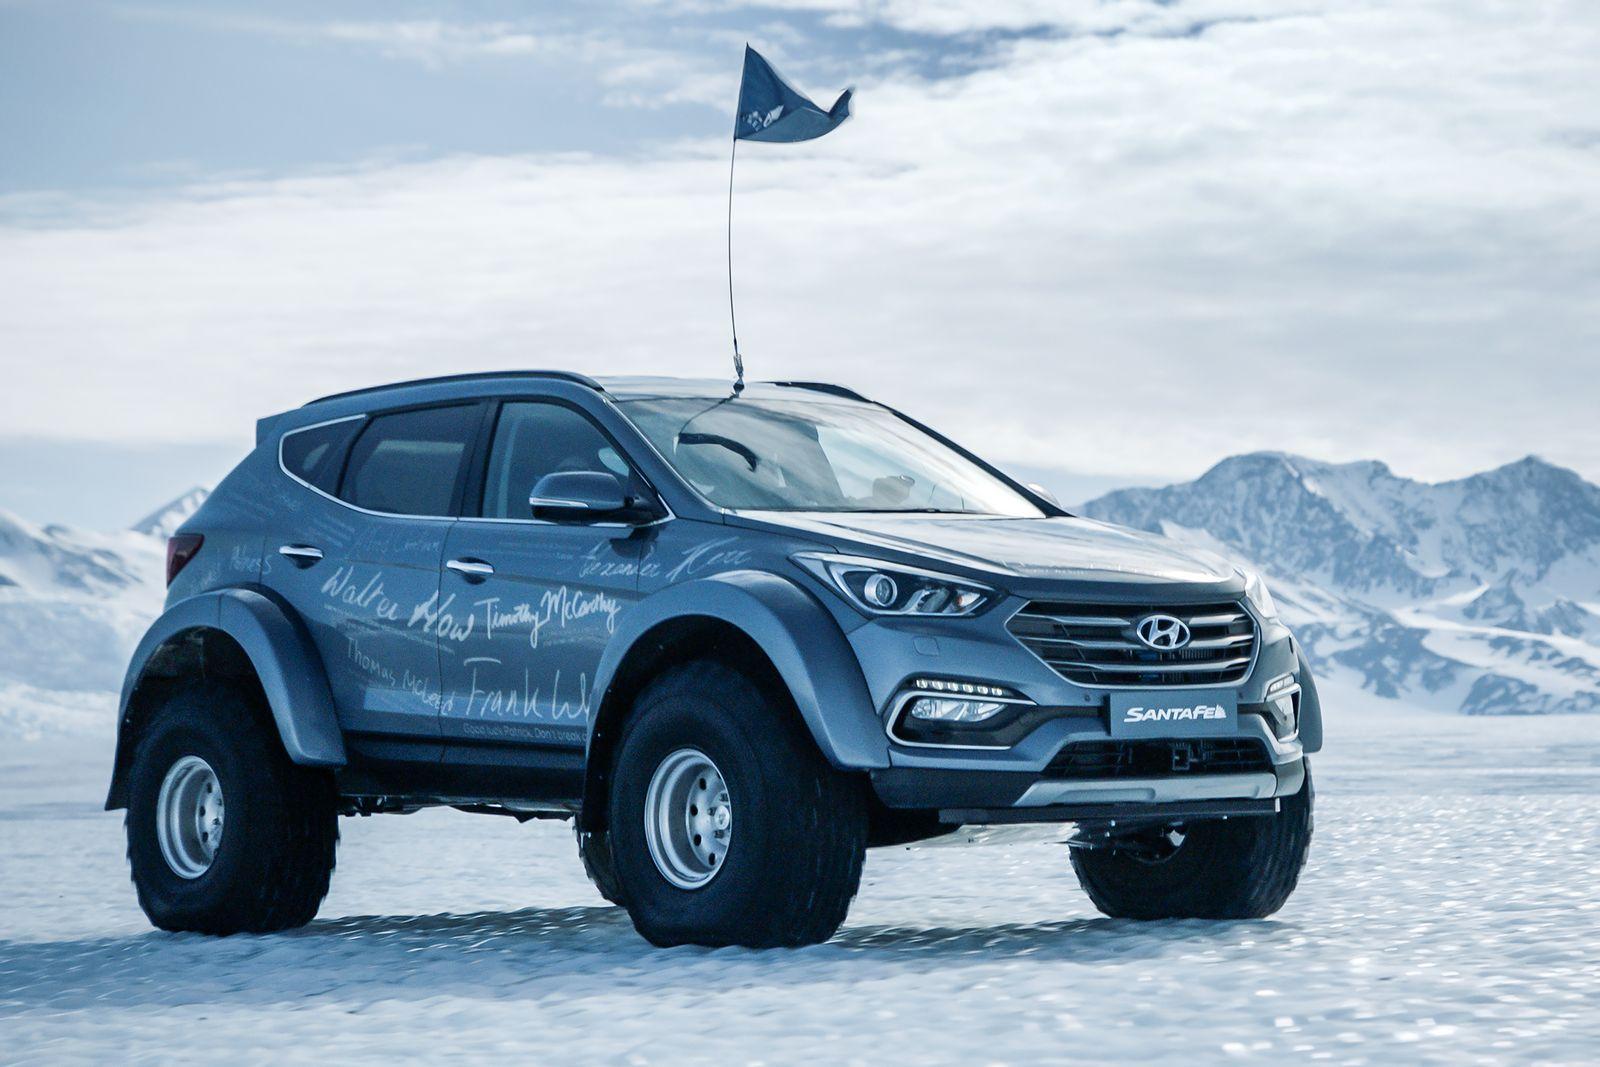 Hyundai Sante Fe Antarctic (1)